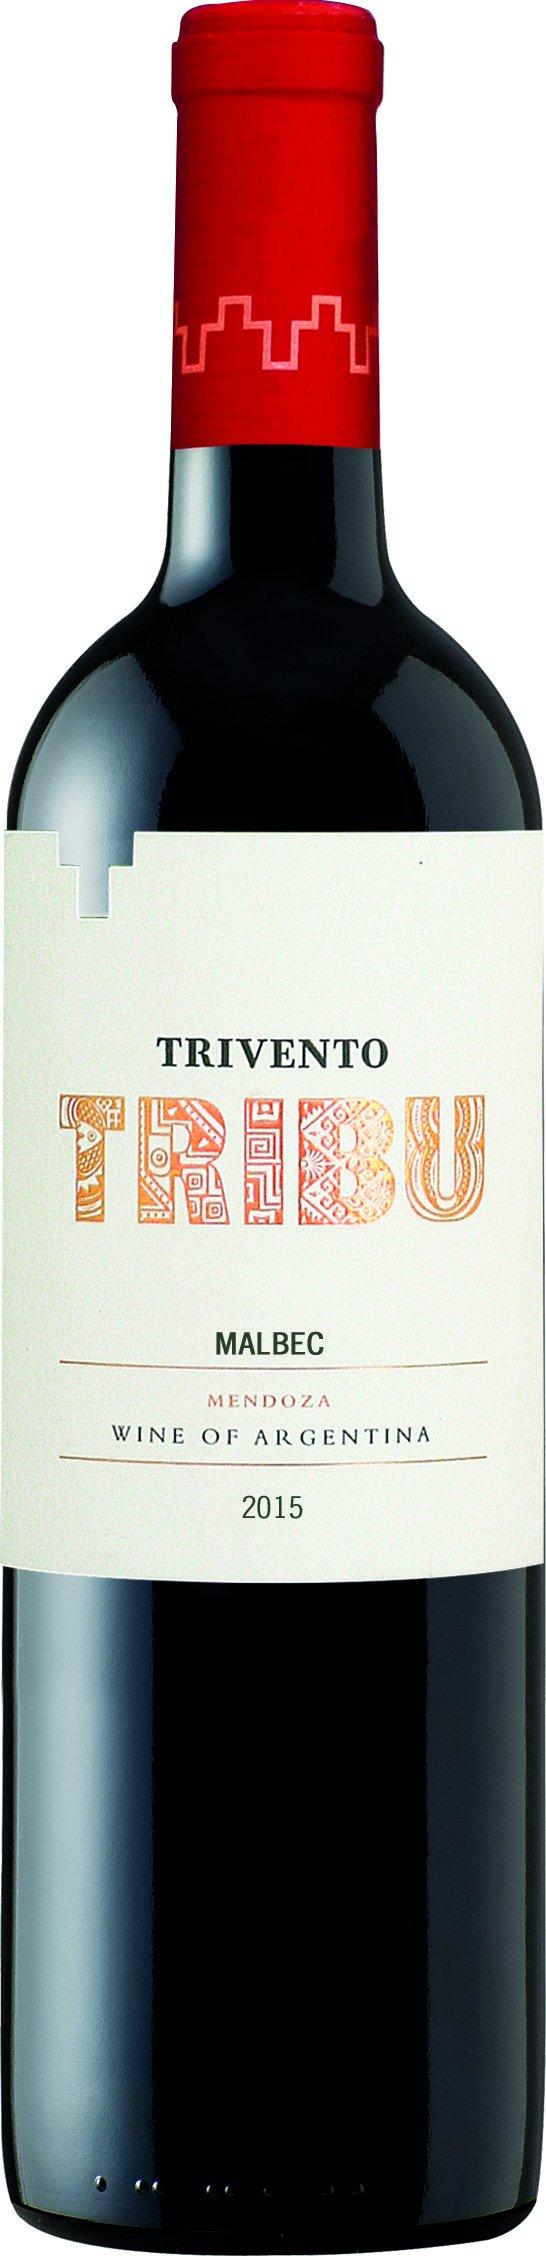 Trivento-TRIBU-Malbec-2015-Trocken-3-x-075-l